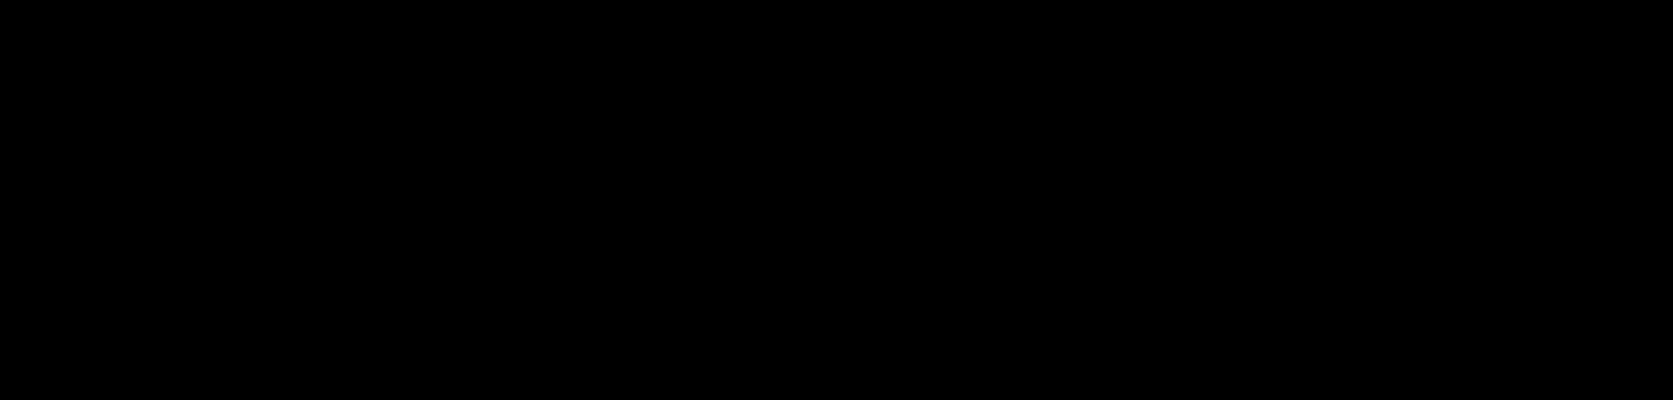 abakode